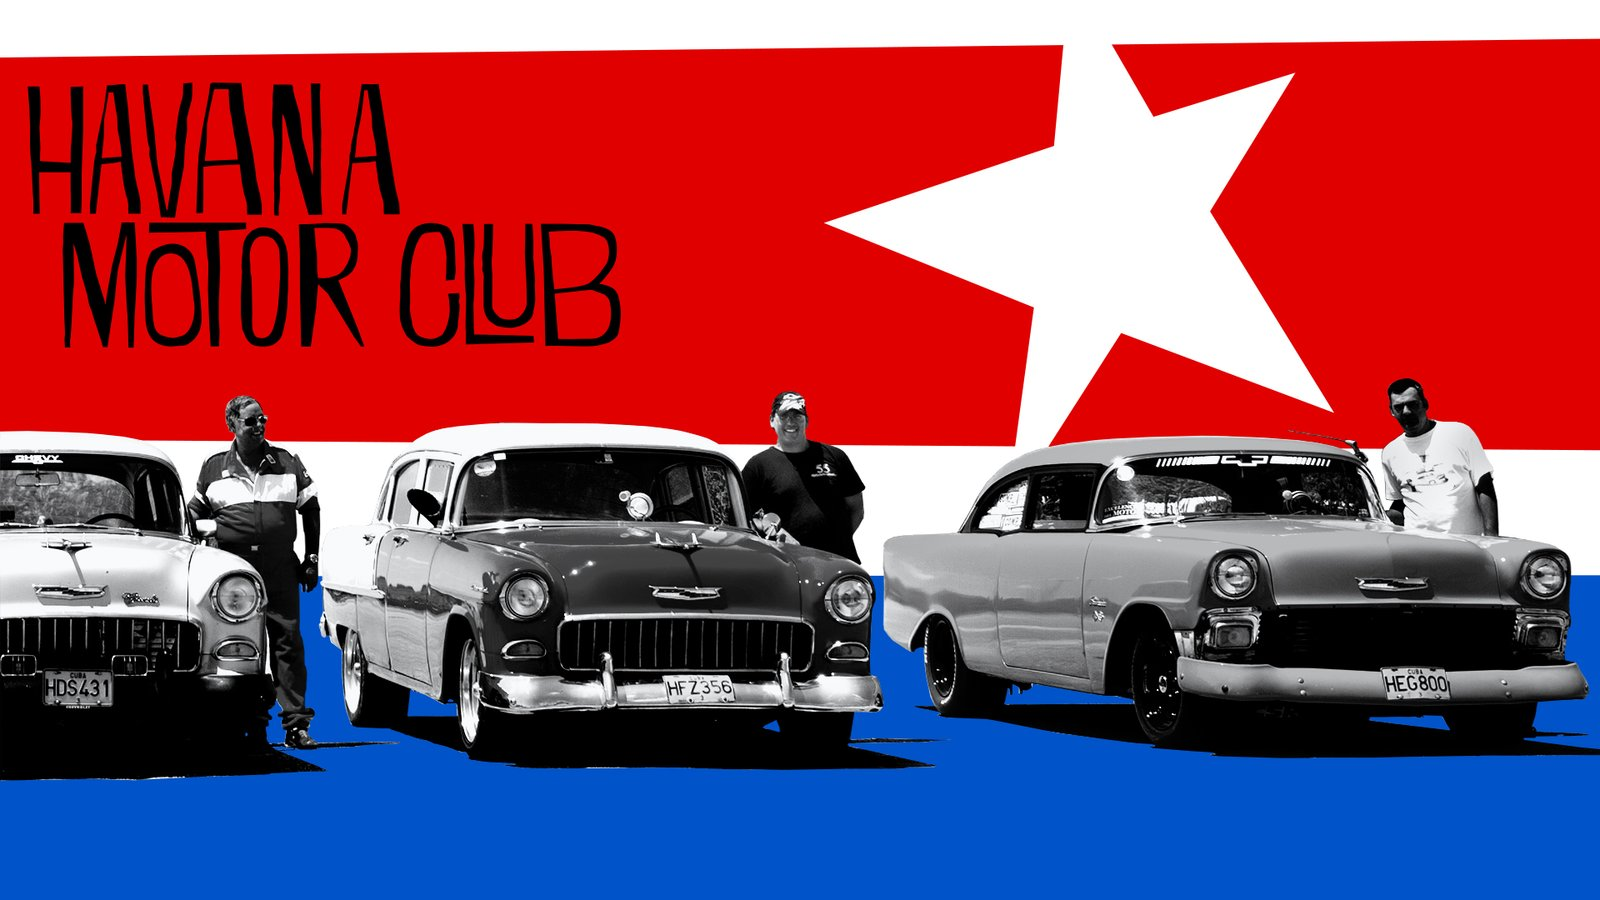 Havana Motor Club - Havana's Underground Drag Racing Community